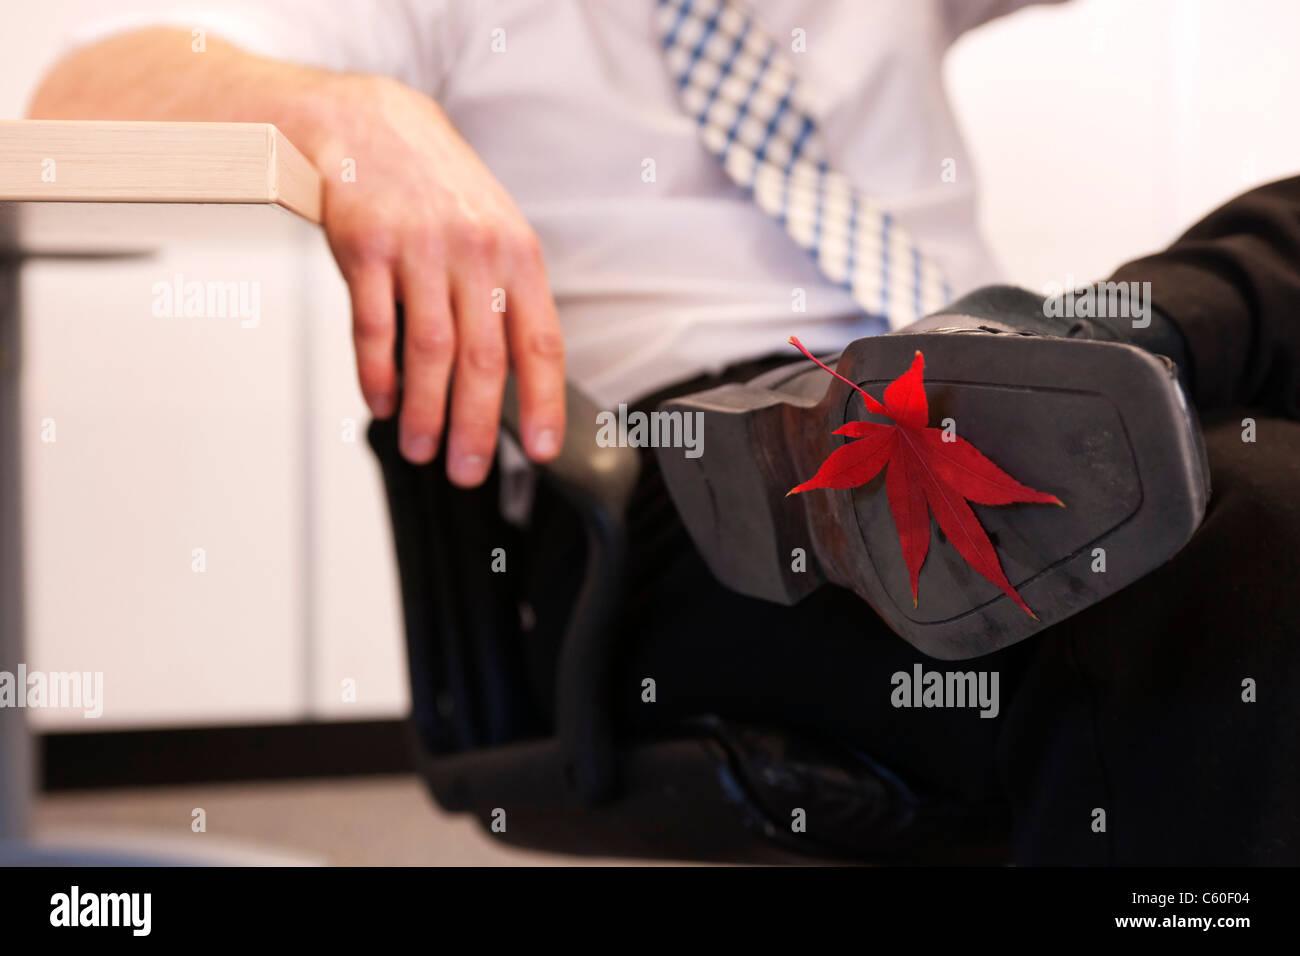 Leaf stuck to businessman's shoe - Stock Image